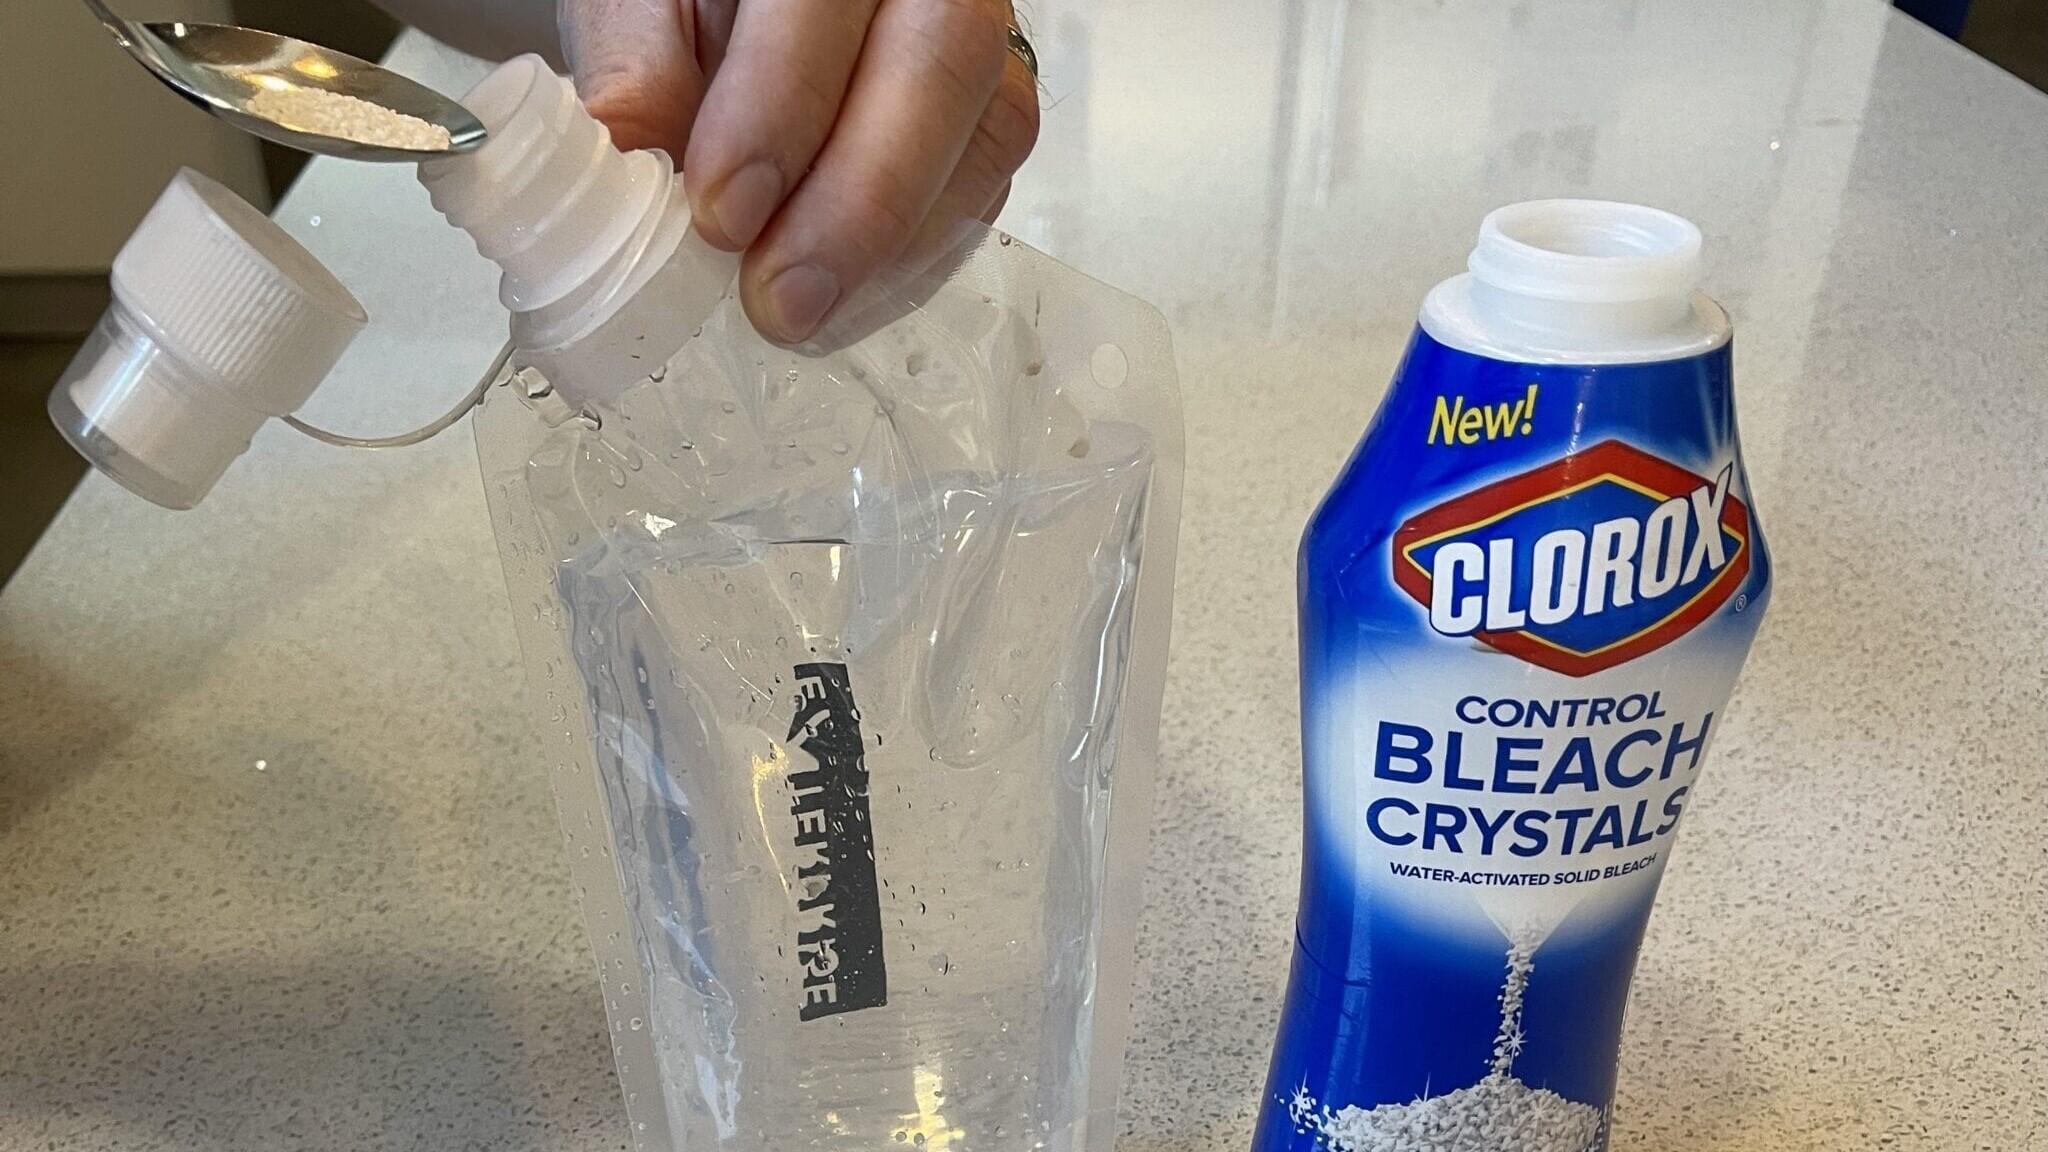 Clorox bleach crystals next to a water bottle.